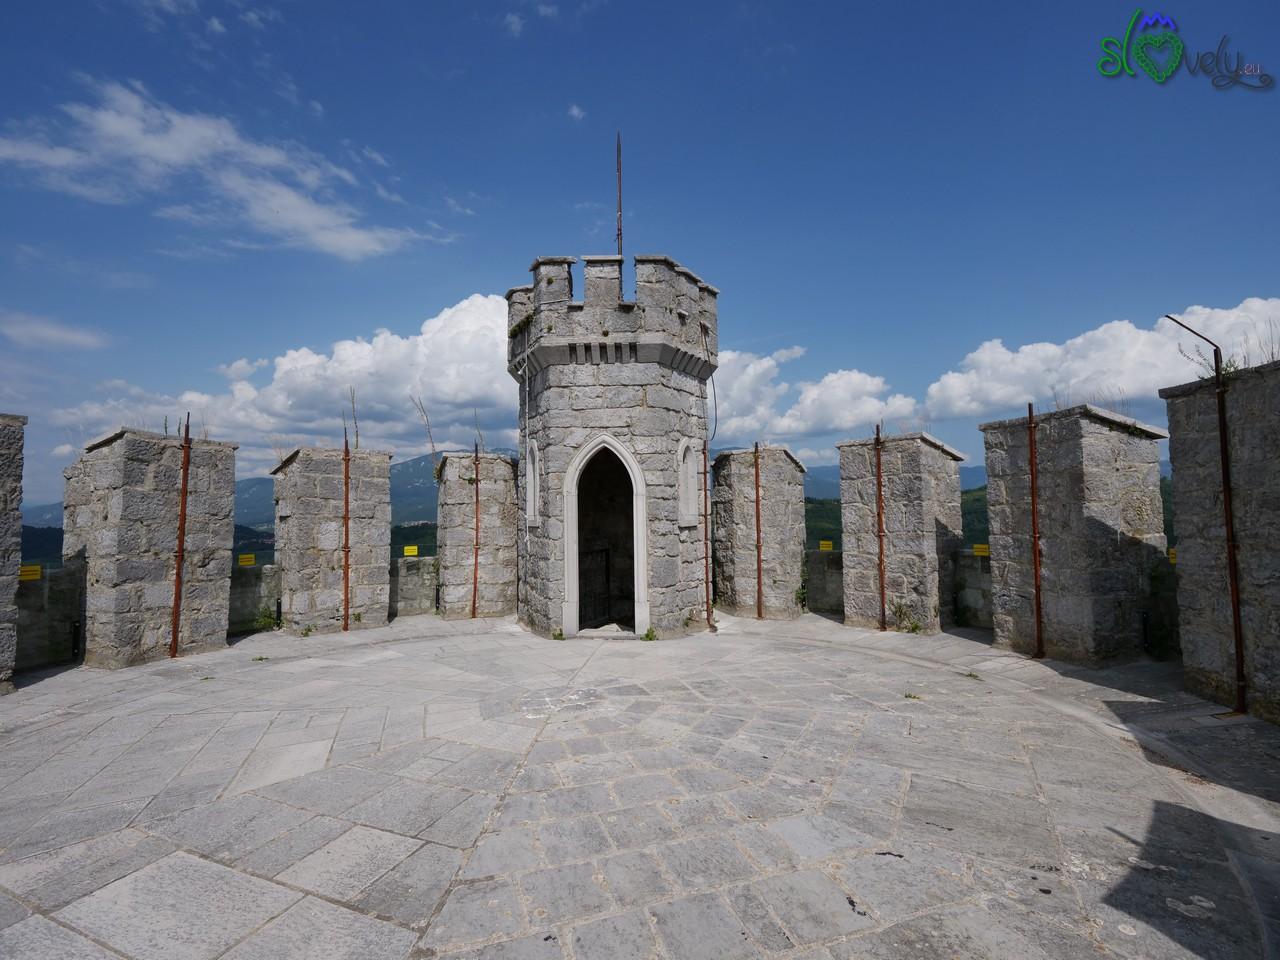 La torre del Grad Rihermberk